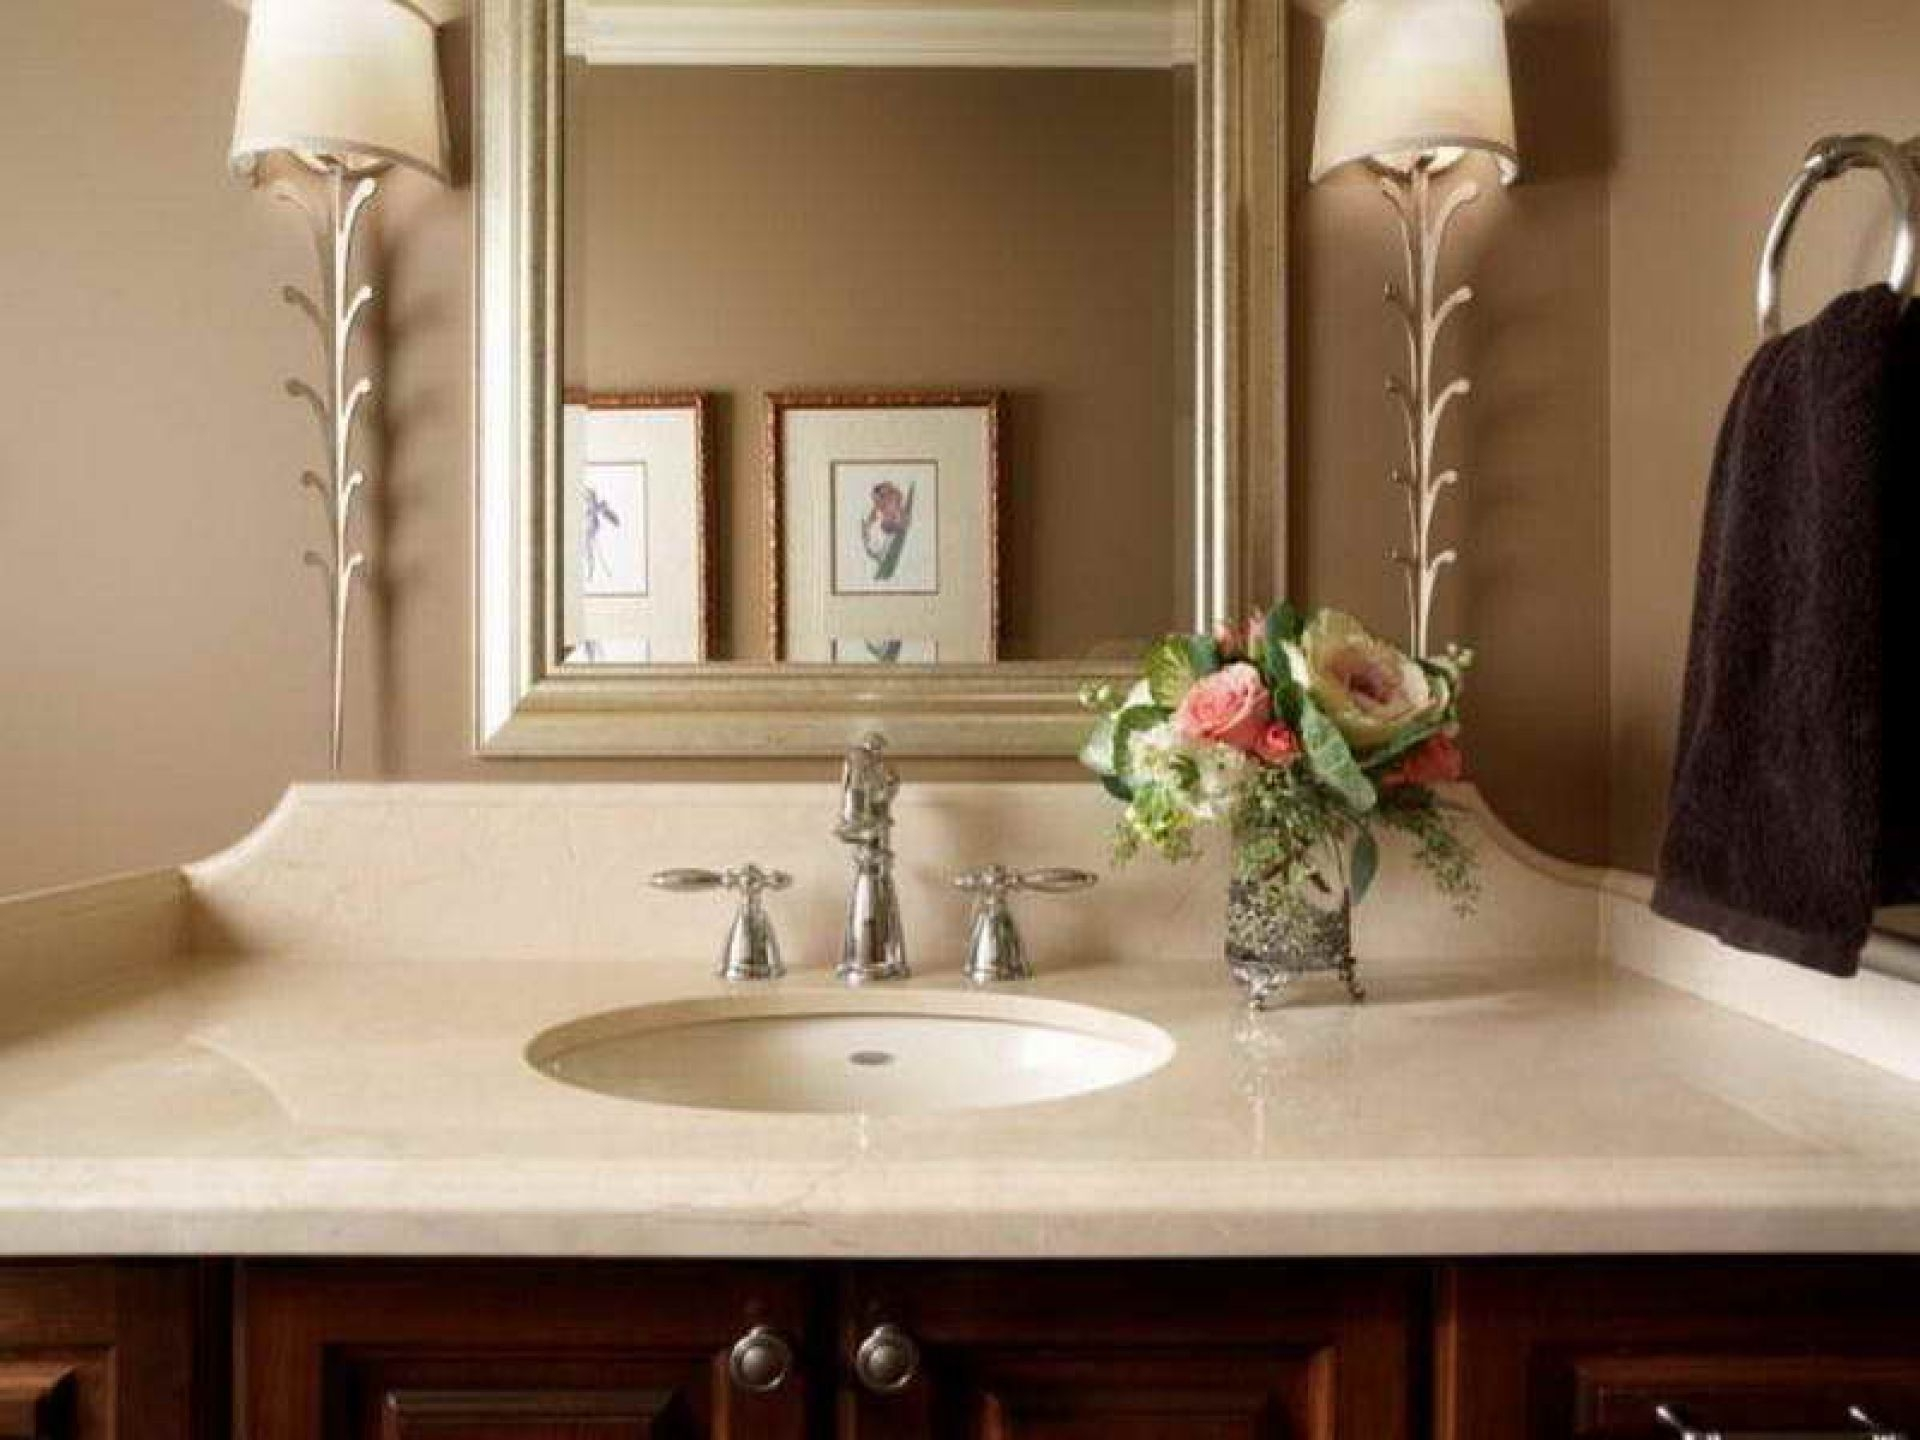 Ideas, kitchen faucet amazing moen one handle kitchen faucet moen regarding sizing 1920 x 1440  .